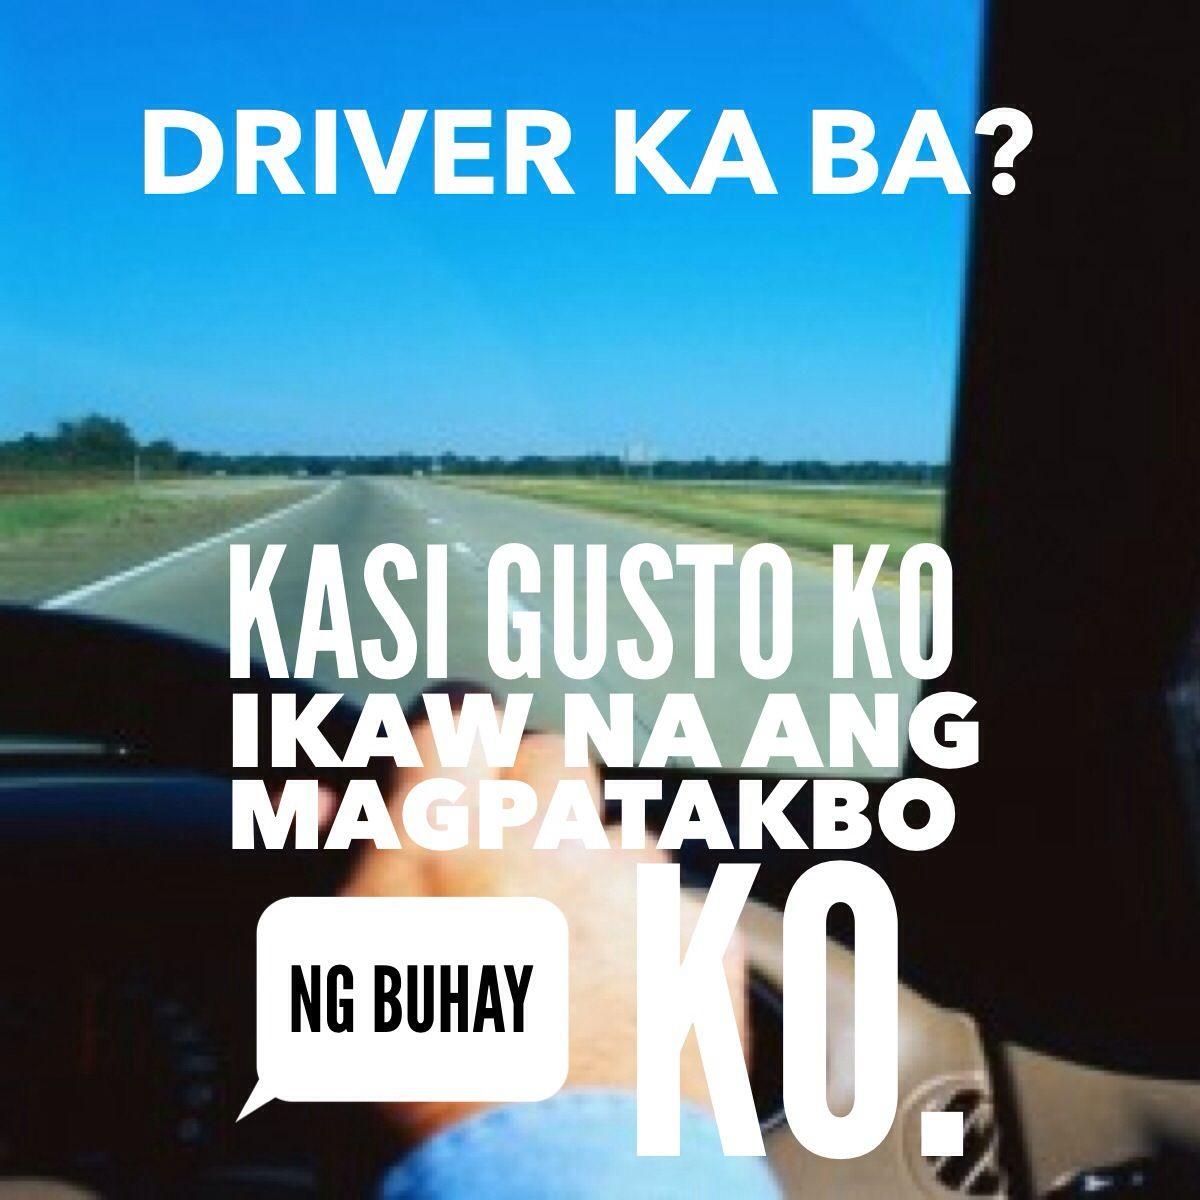 Pinoy PickUp Lines   Tagalog quotes hugot funny, Pick up ...